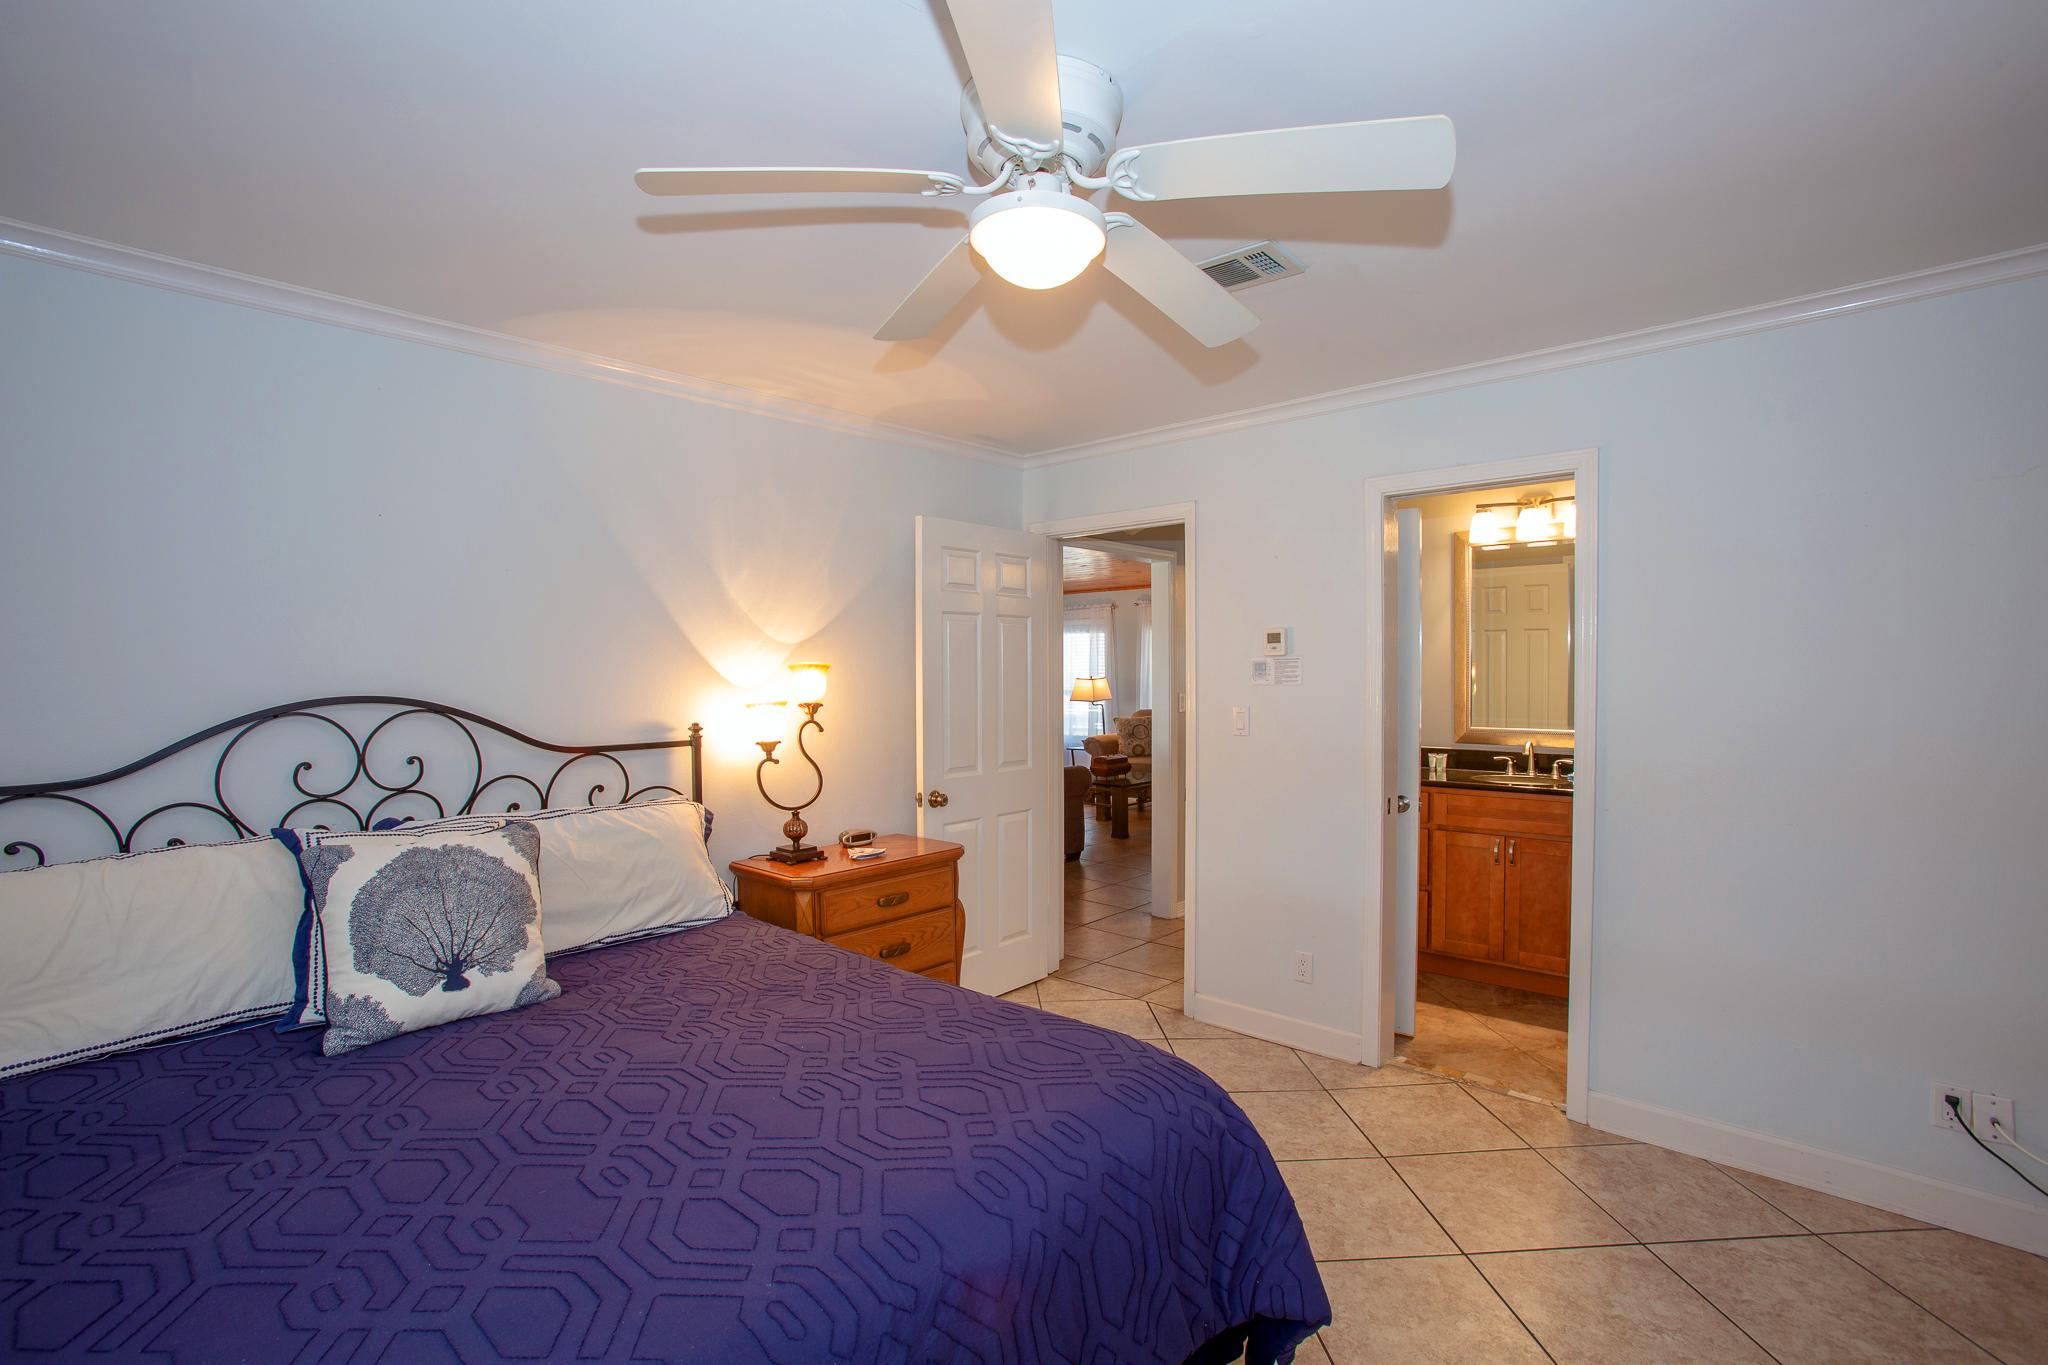 Maldonado 1015 - Sea the Big Picture House/Cottage rental in Pensacola Beach House Rentals in Pensacola Beach Florida - #14